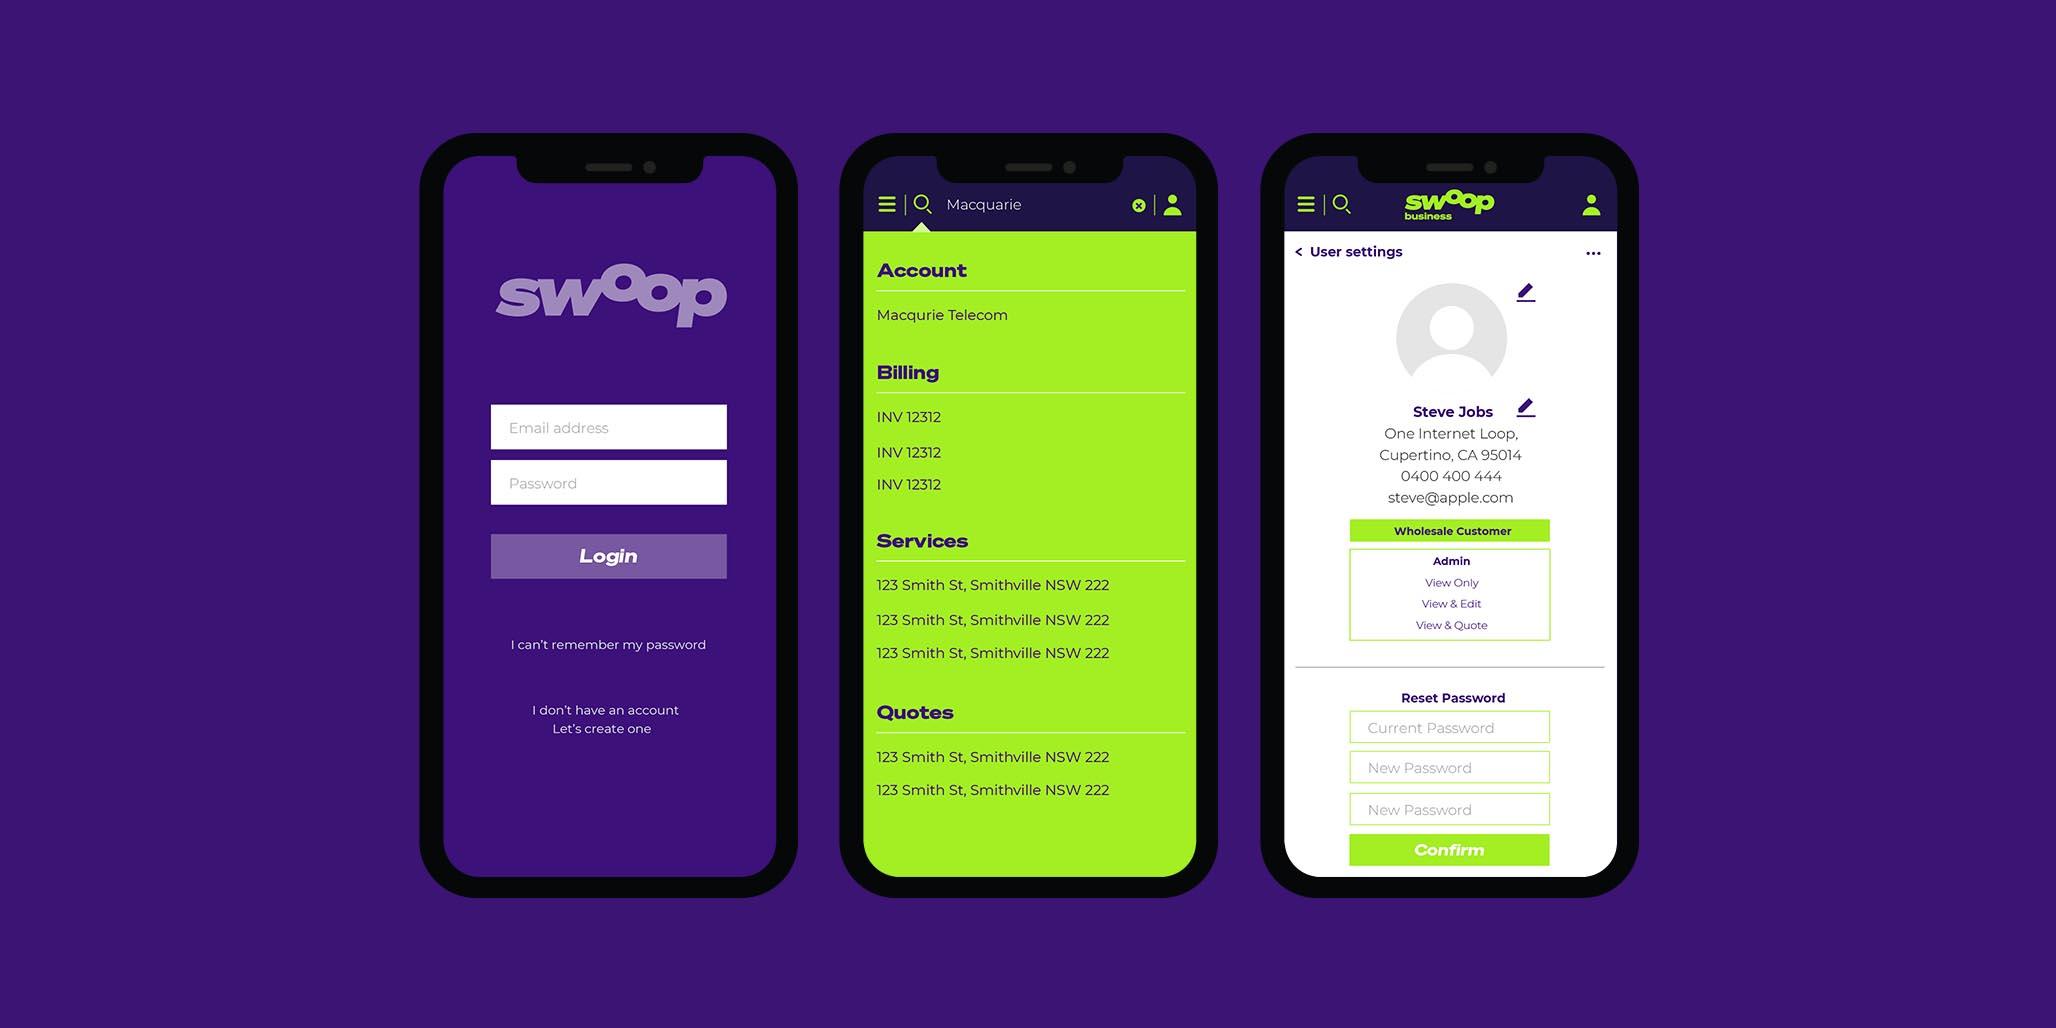 Brand Agency, Percept, create Brand Identity for Swoop, an Australian telco company, image L